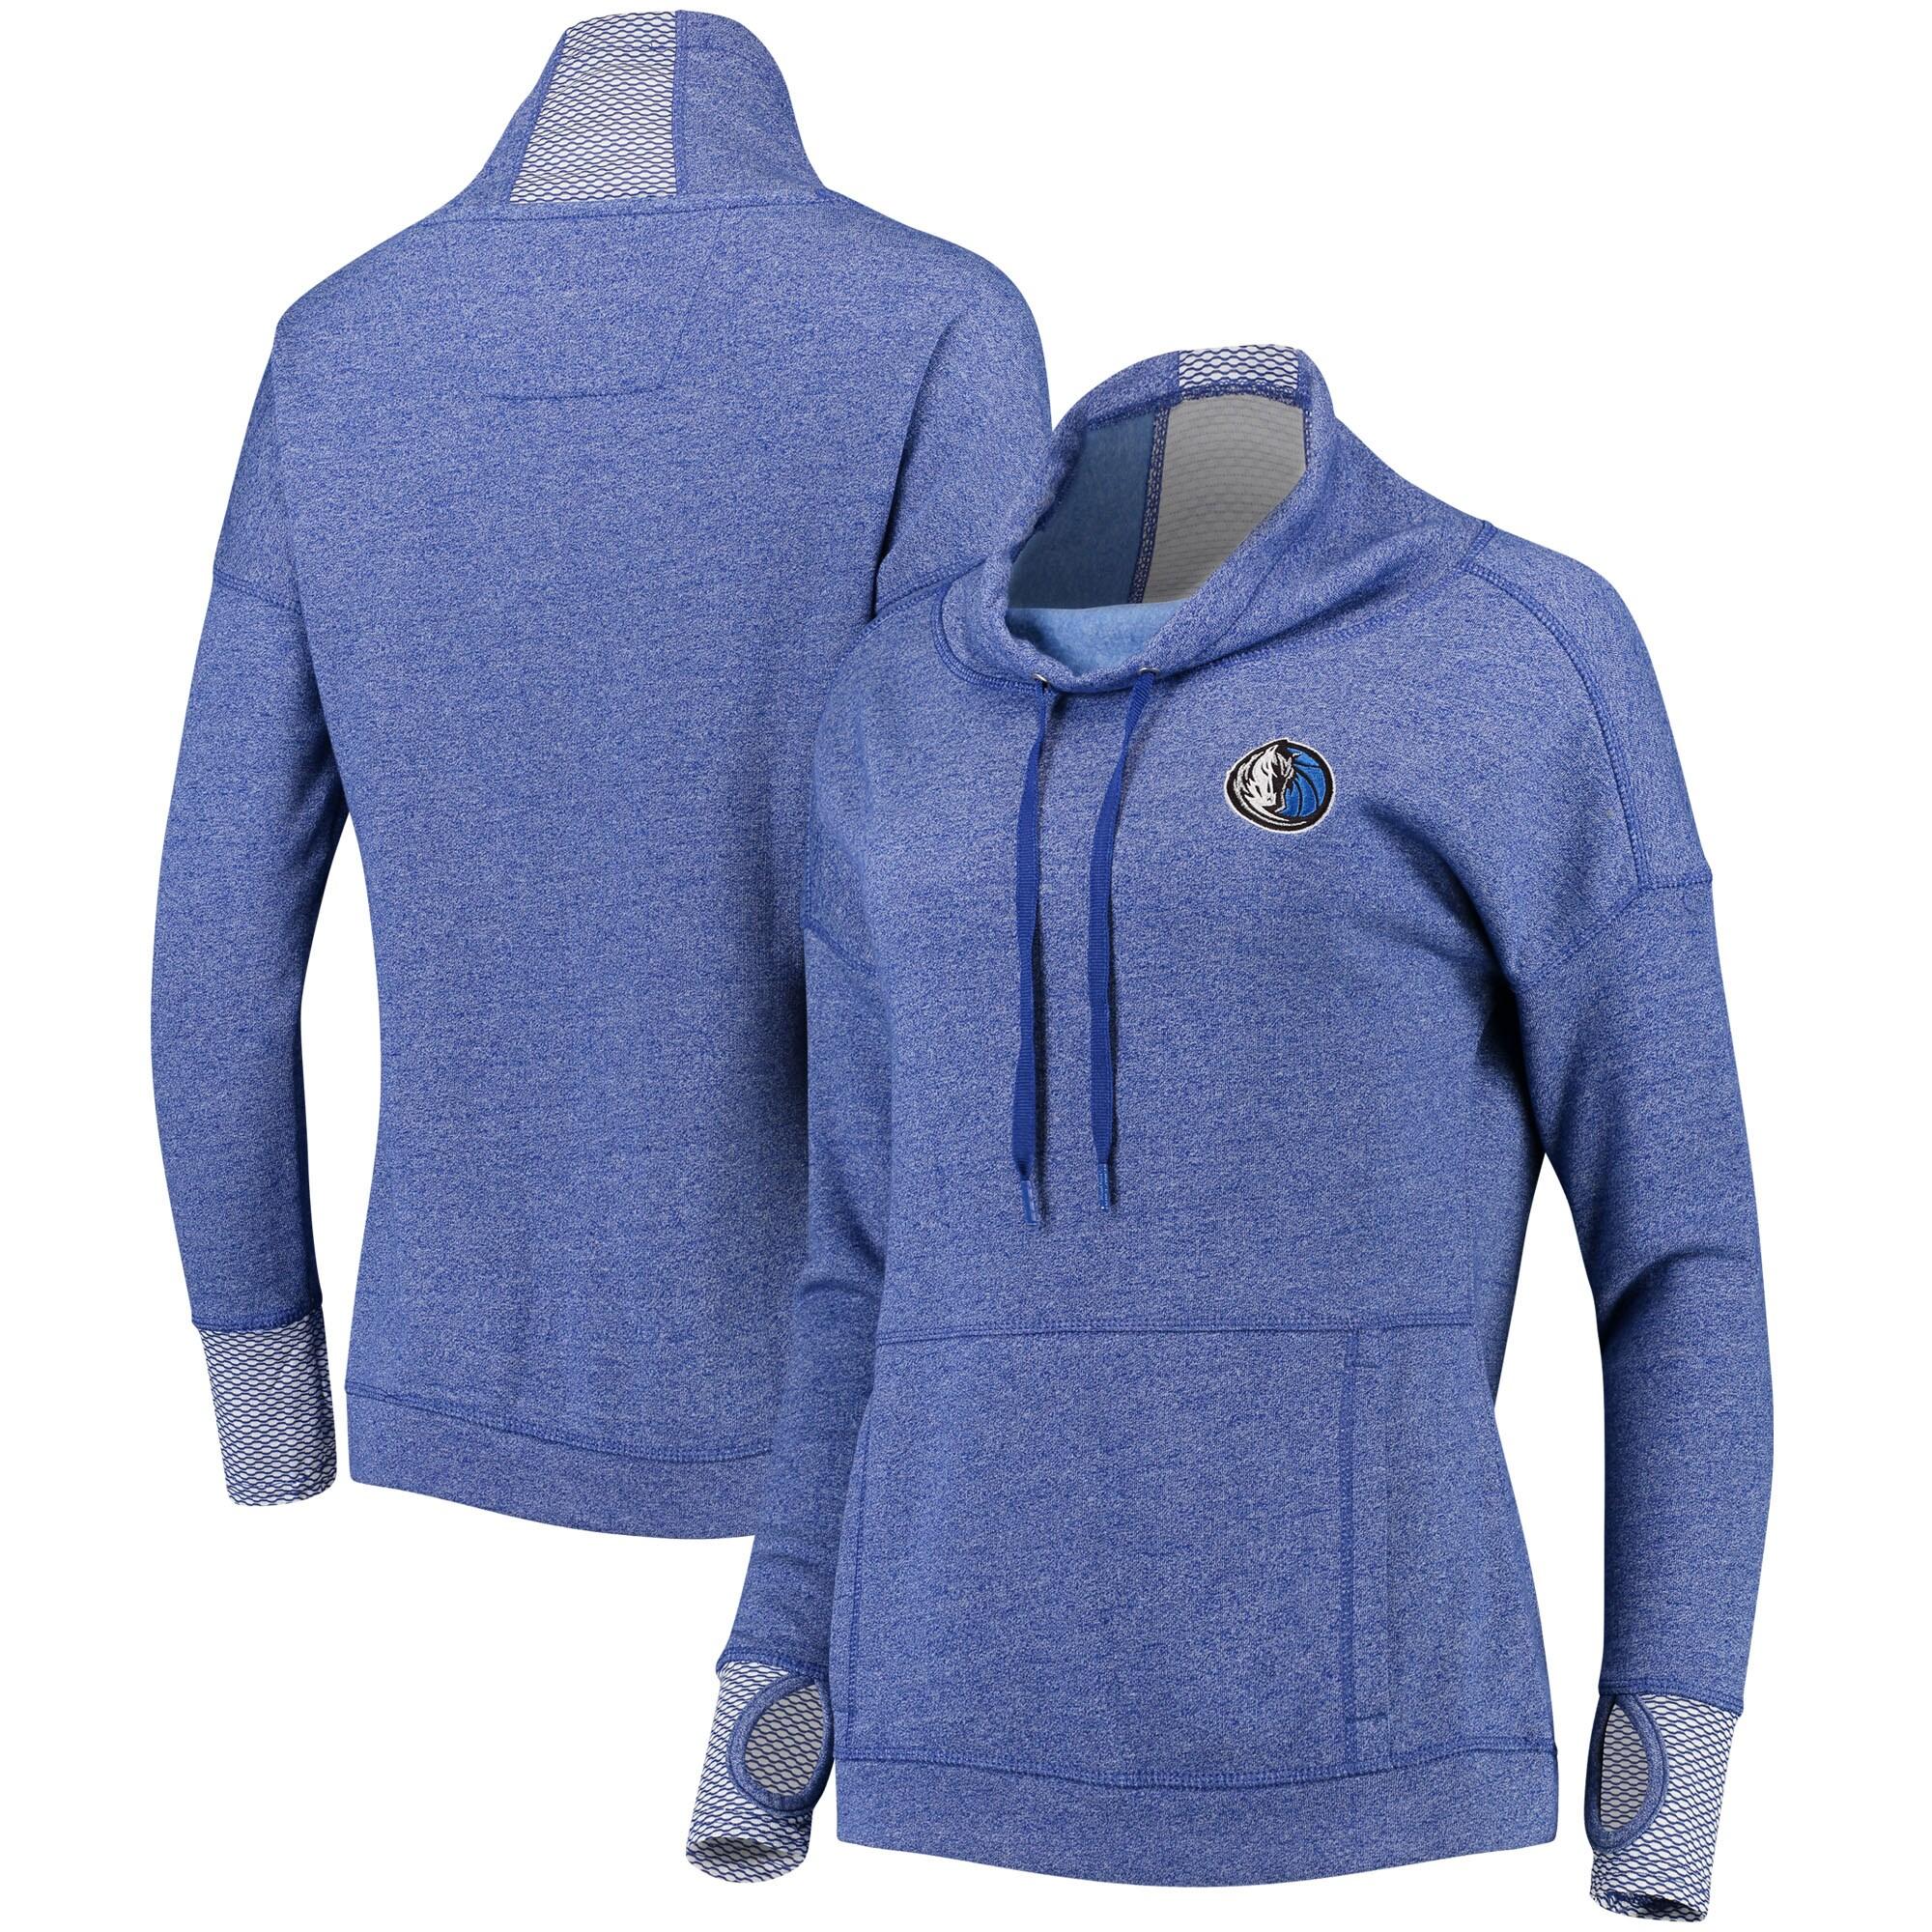 Dallas Mavericks Antigua Women's Snap Cowl Neck Pullover Sweatshirt - Heathered Royal